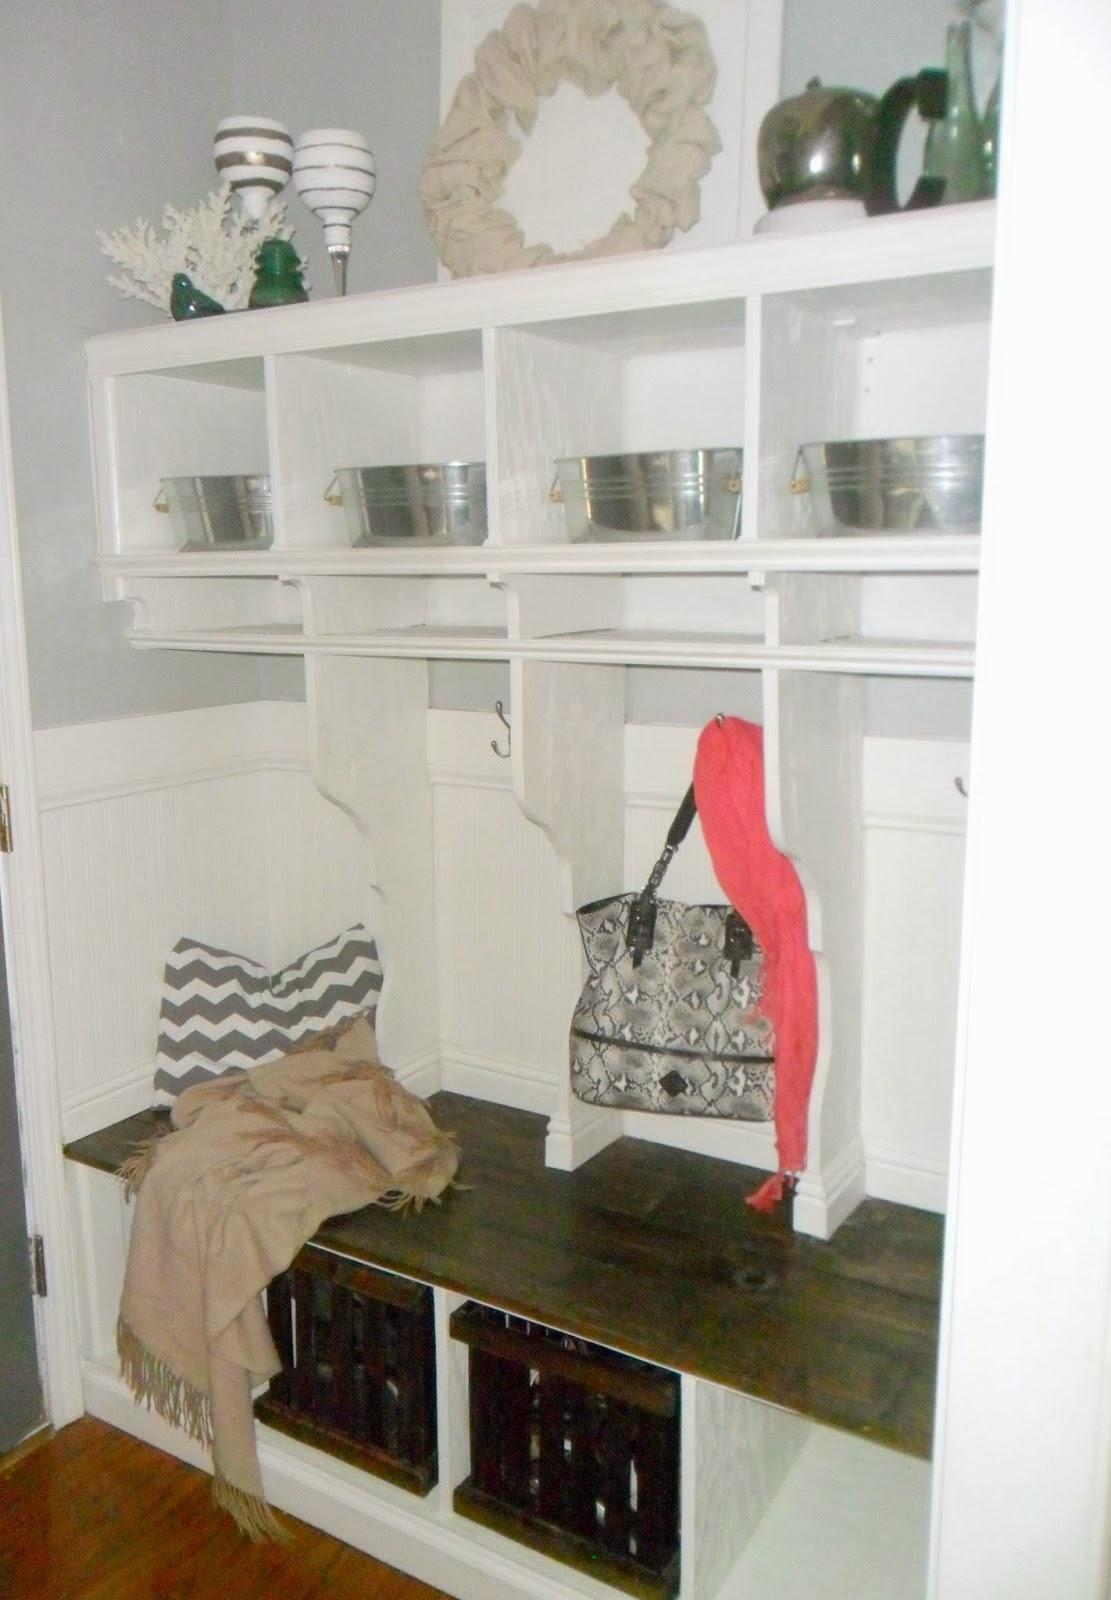 Kitchen Under Stairs Cubby Hole Ideas